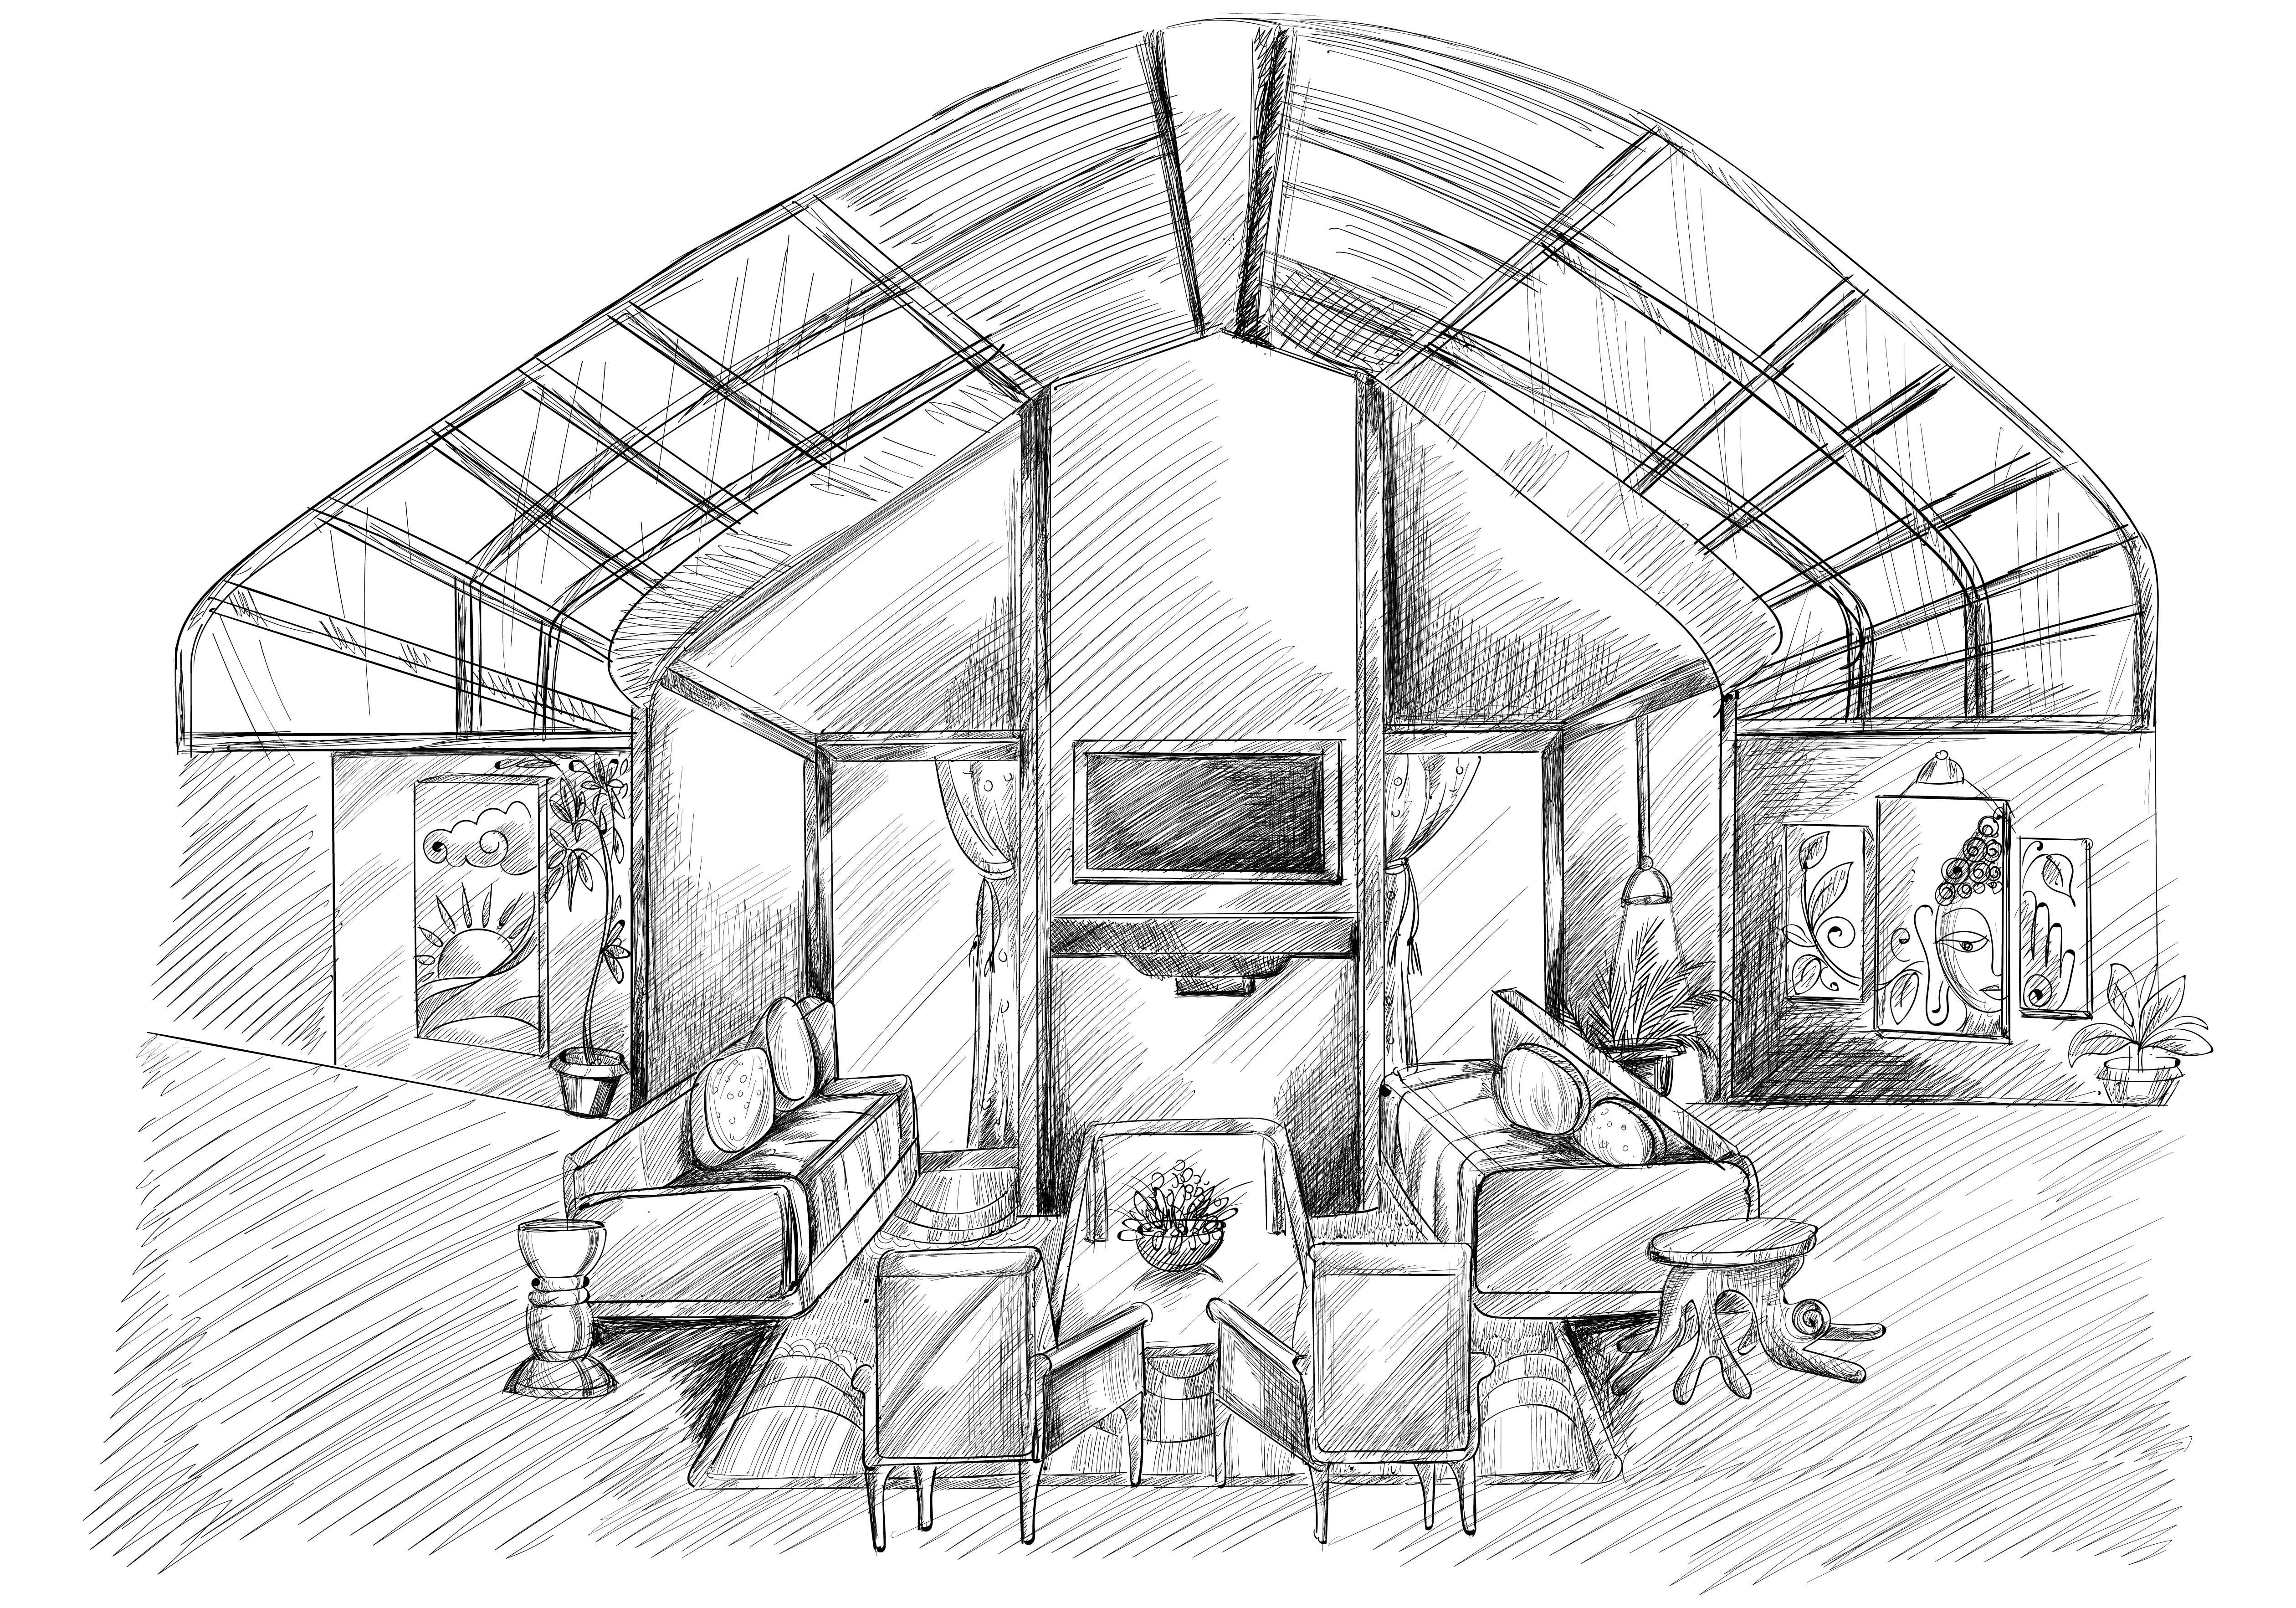 Hand Drawn Home Den Interior Sketch Design vector